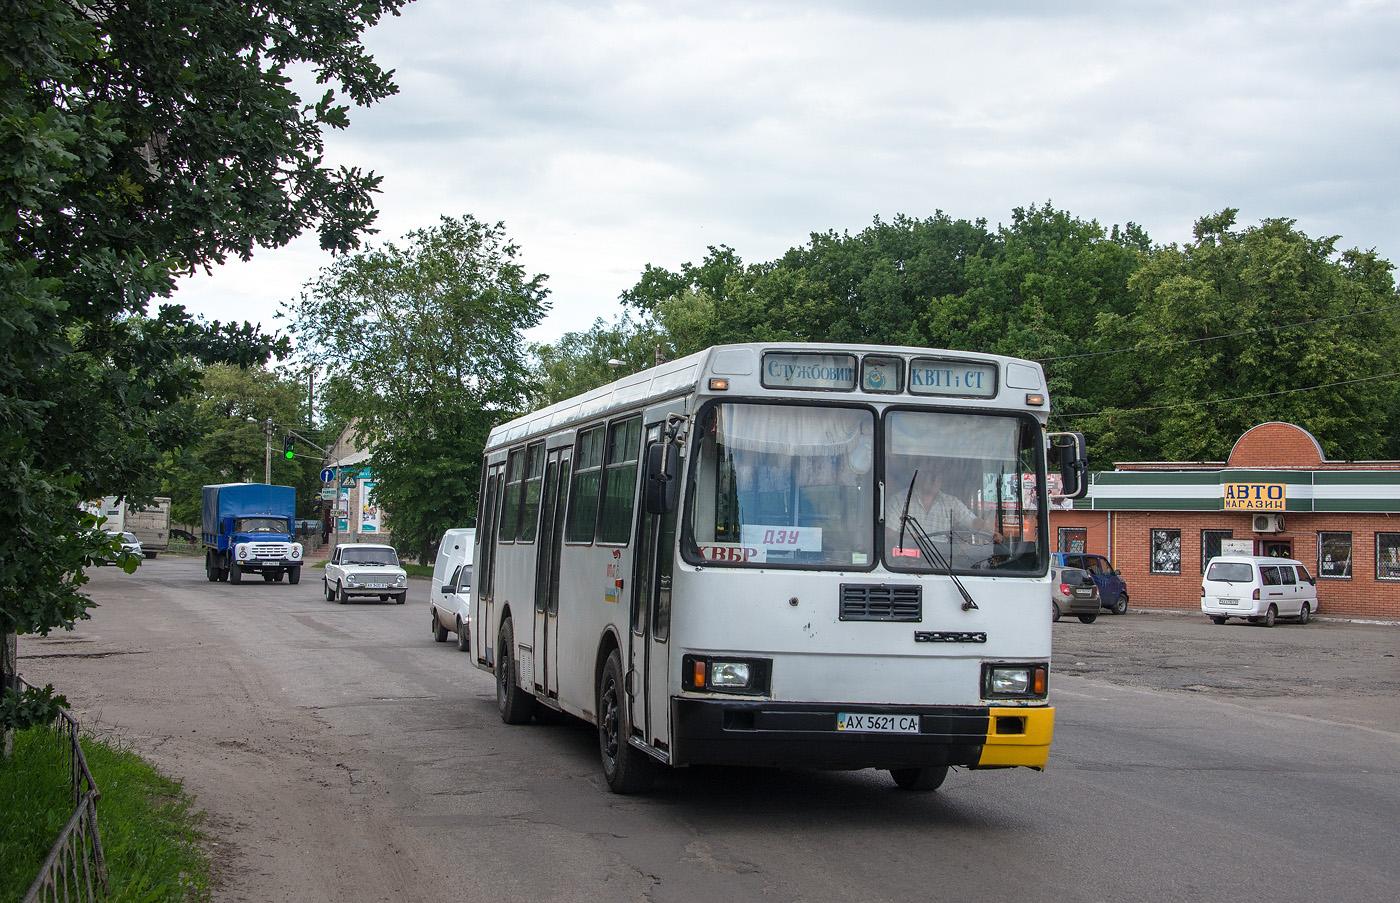 ЛАЗ-52523 №АХ 5621 СА. Харківська область, Красноград